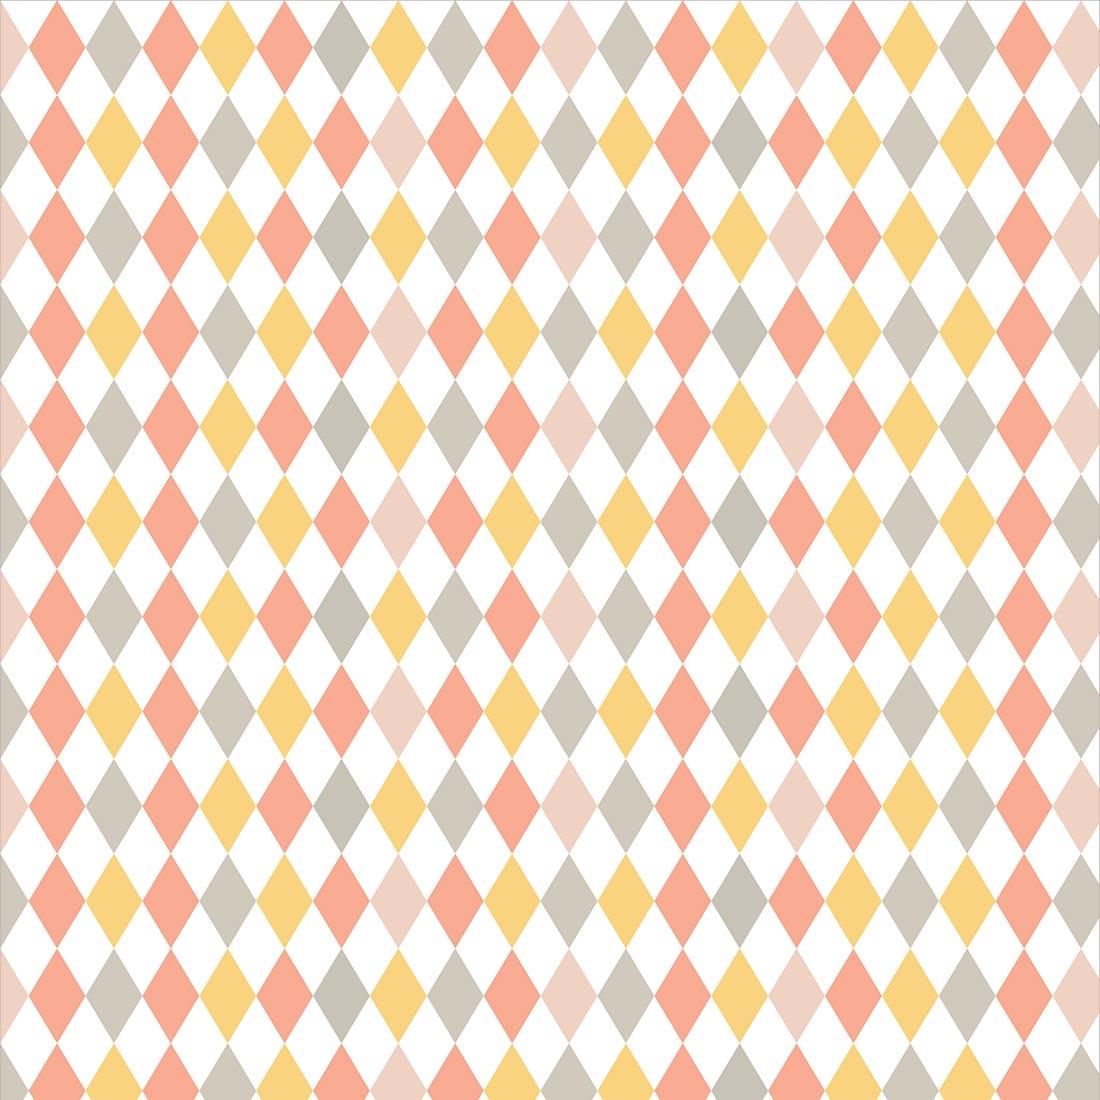 Papel de Parede Geométrico Prisma Colorido